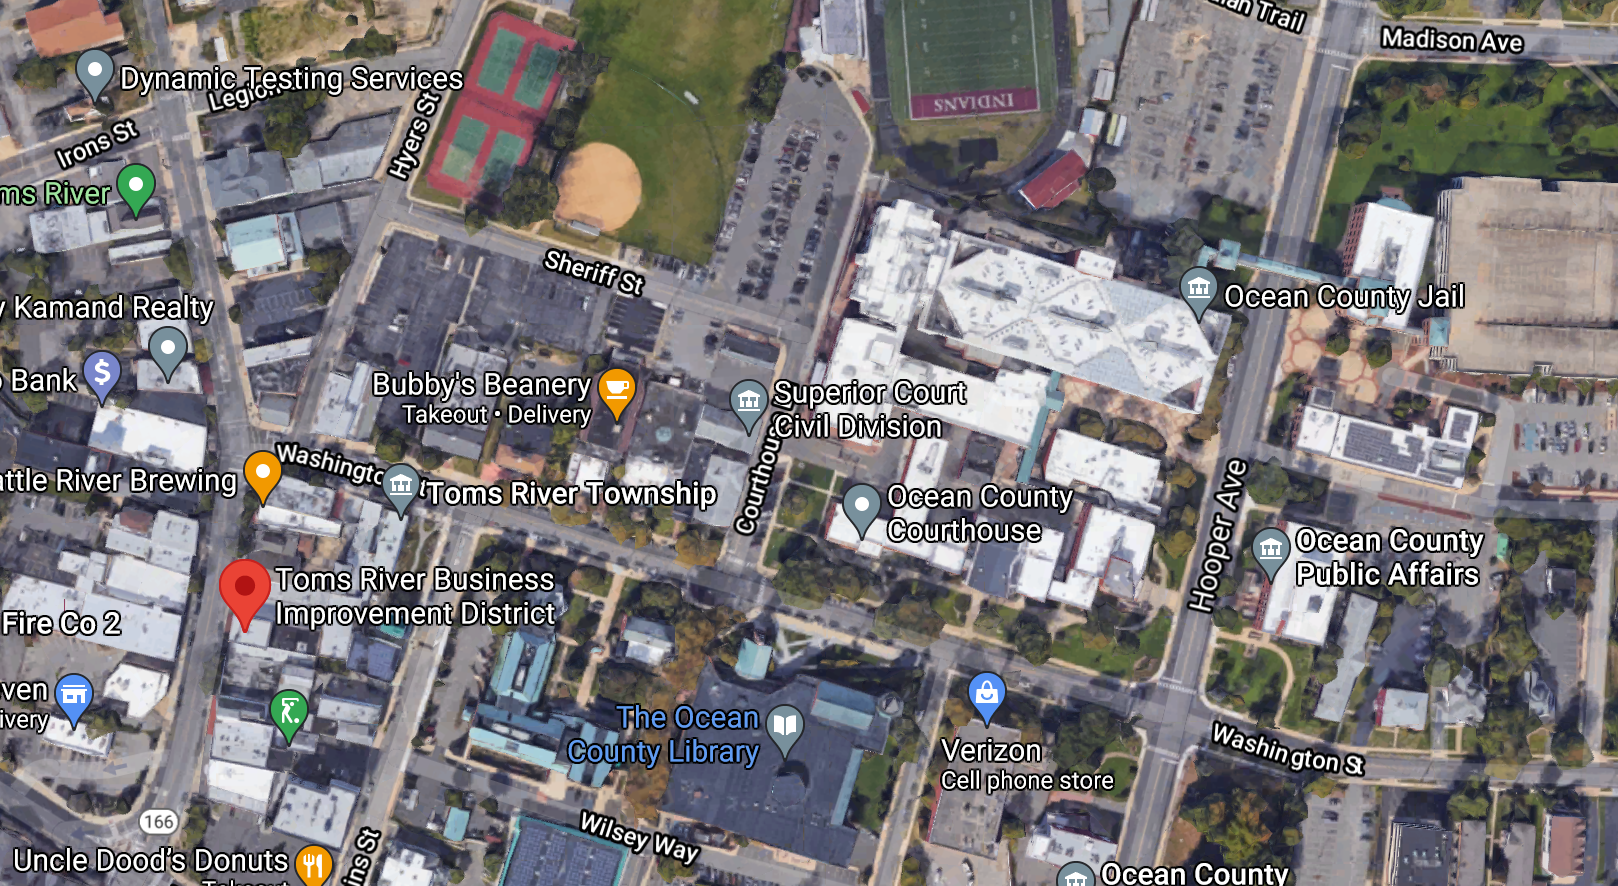 Washington Street, Toms River, N.J. (Credit: Google Maps)